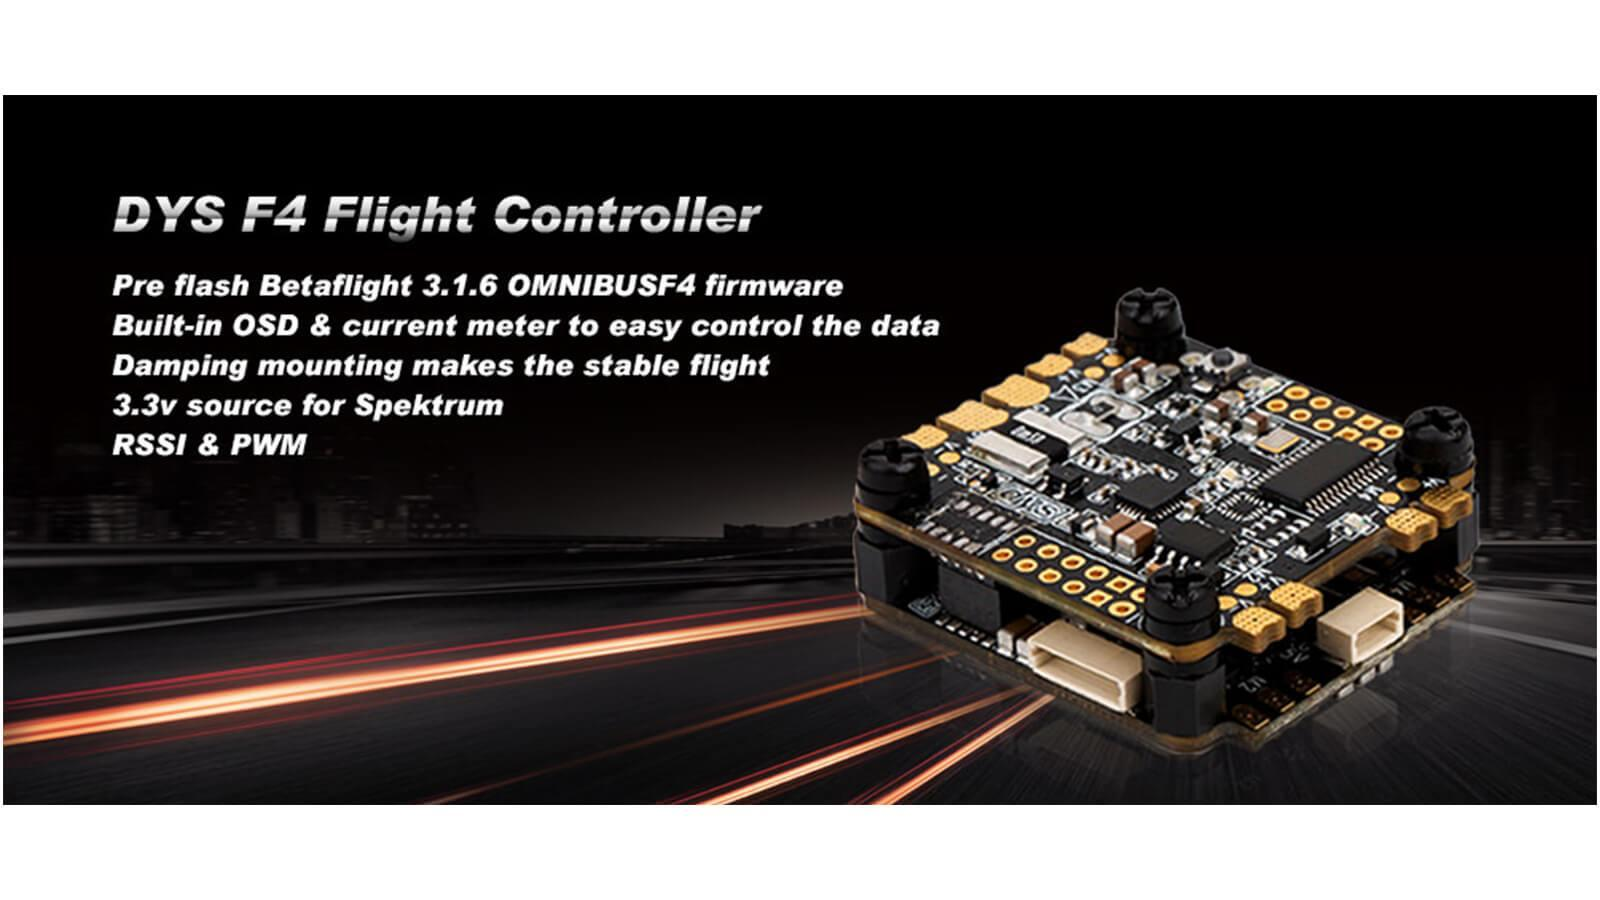 DYS F4 Pro Flight Controller